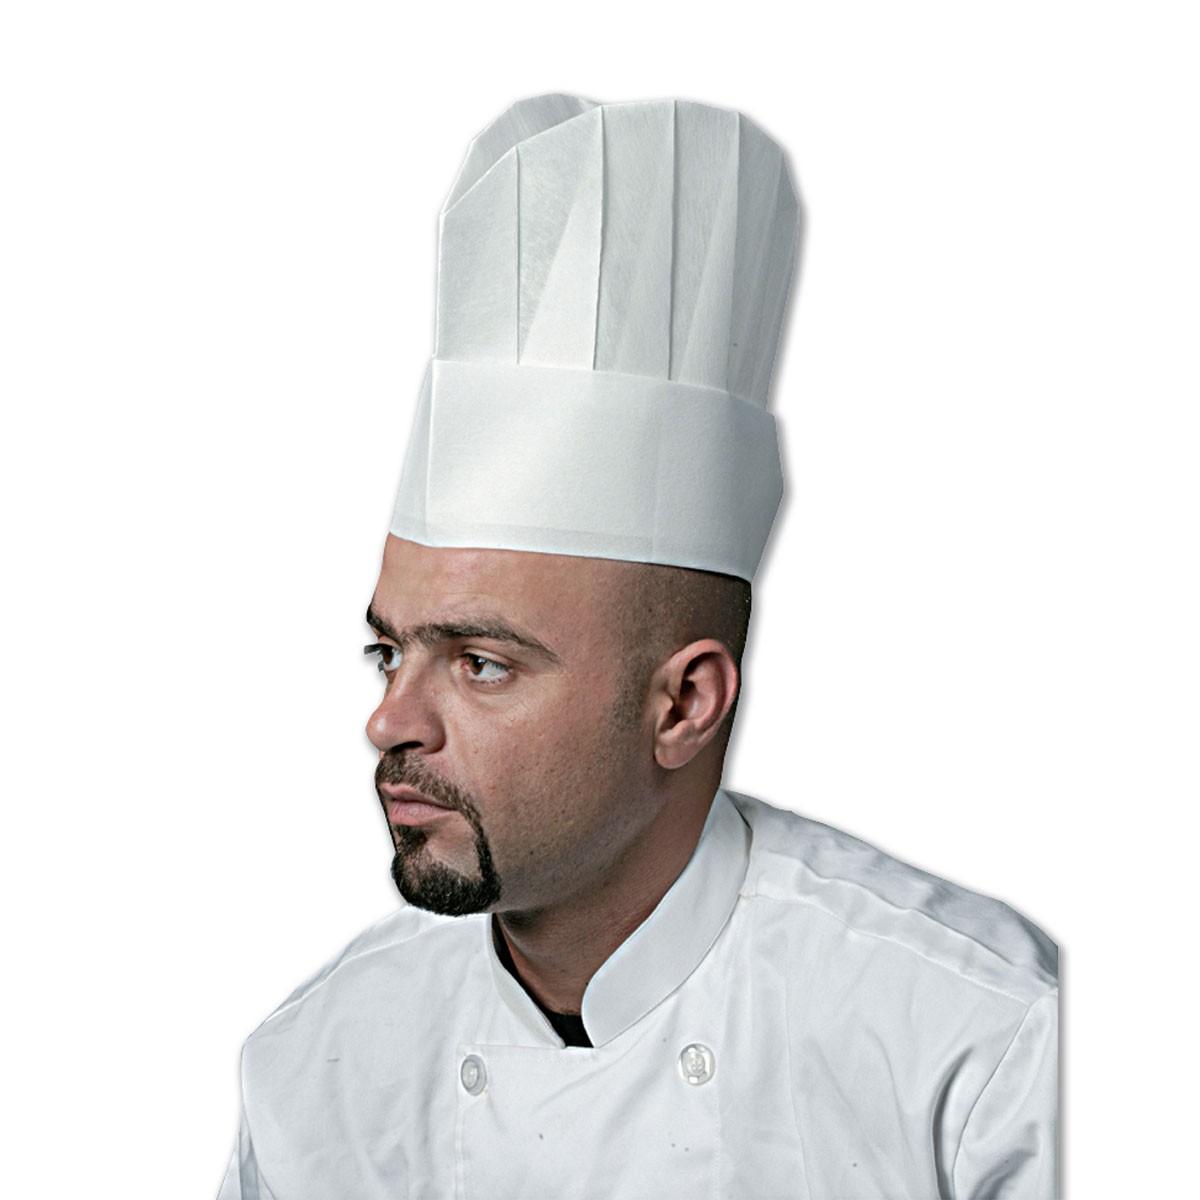 Non-woven Chef  Hat 12in - Flat Top   10pcsx10pkts